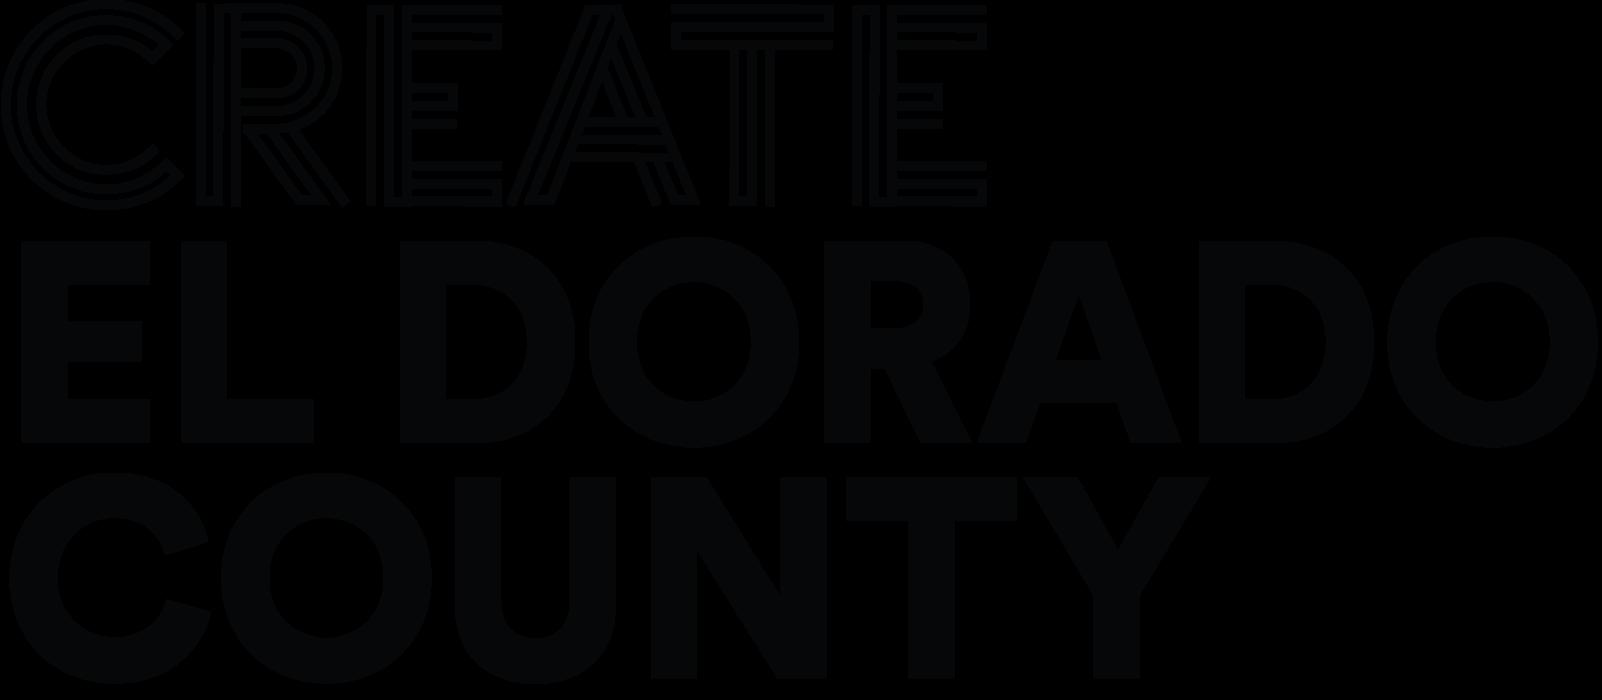 https://createca.org/wp-content/uploads/2020/01/Create-Ca-County-Logos-08-e1580493351662.png